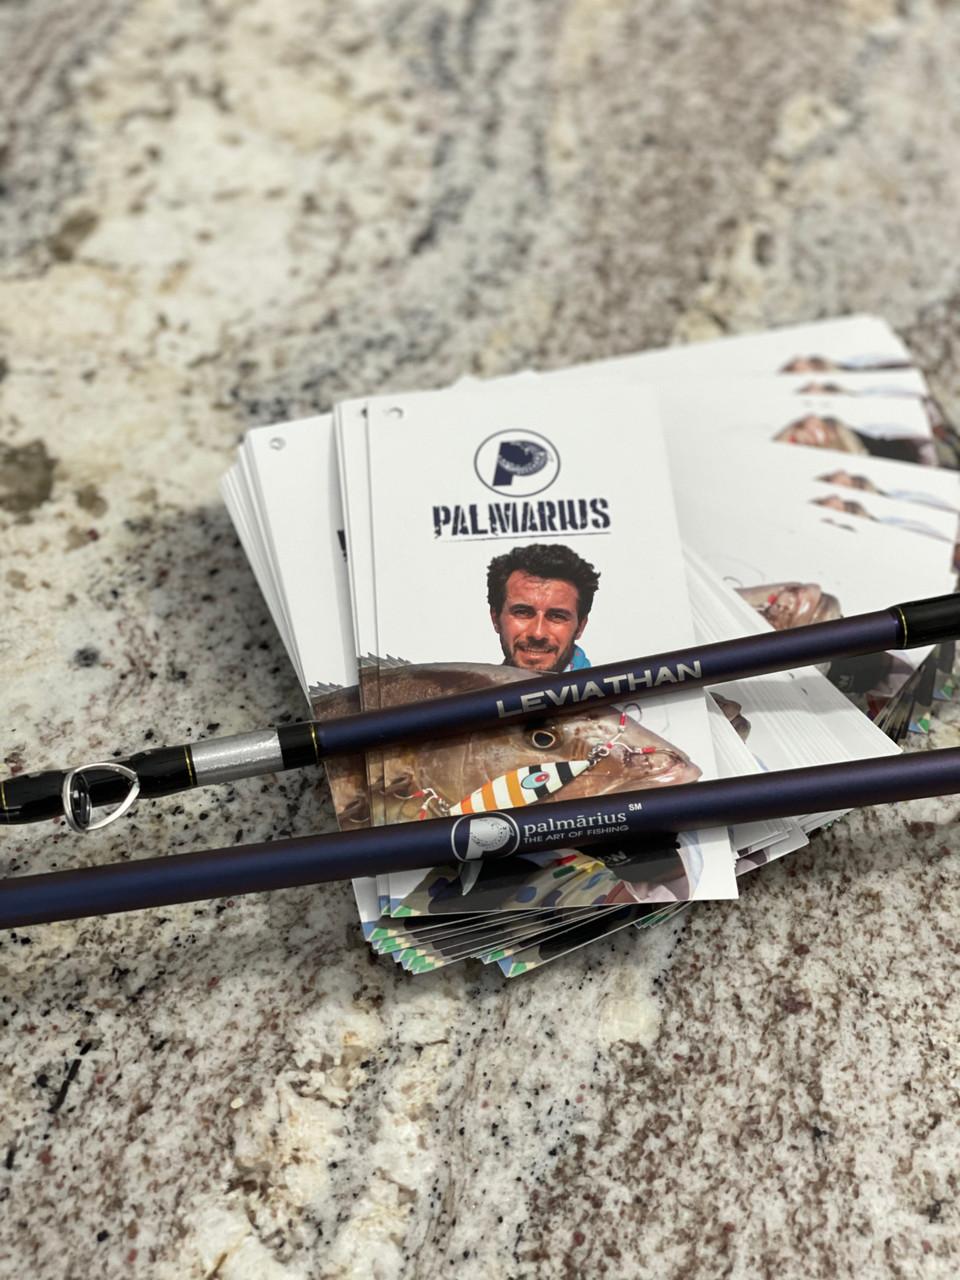 "Palmarius Leviathan 7'2"" 2.18M Slow pitch jigging rods"